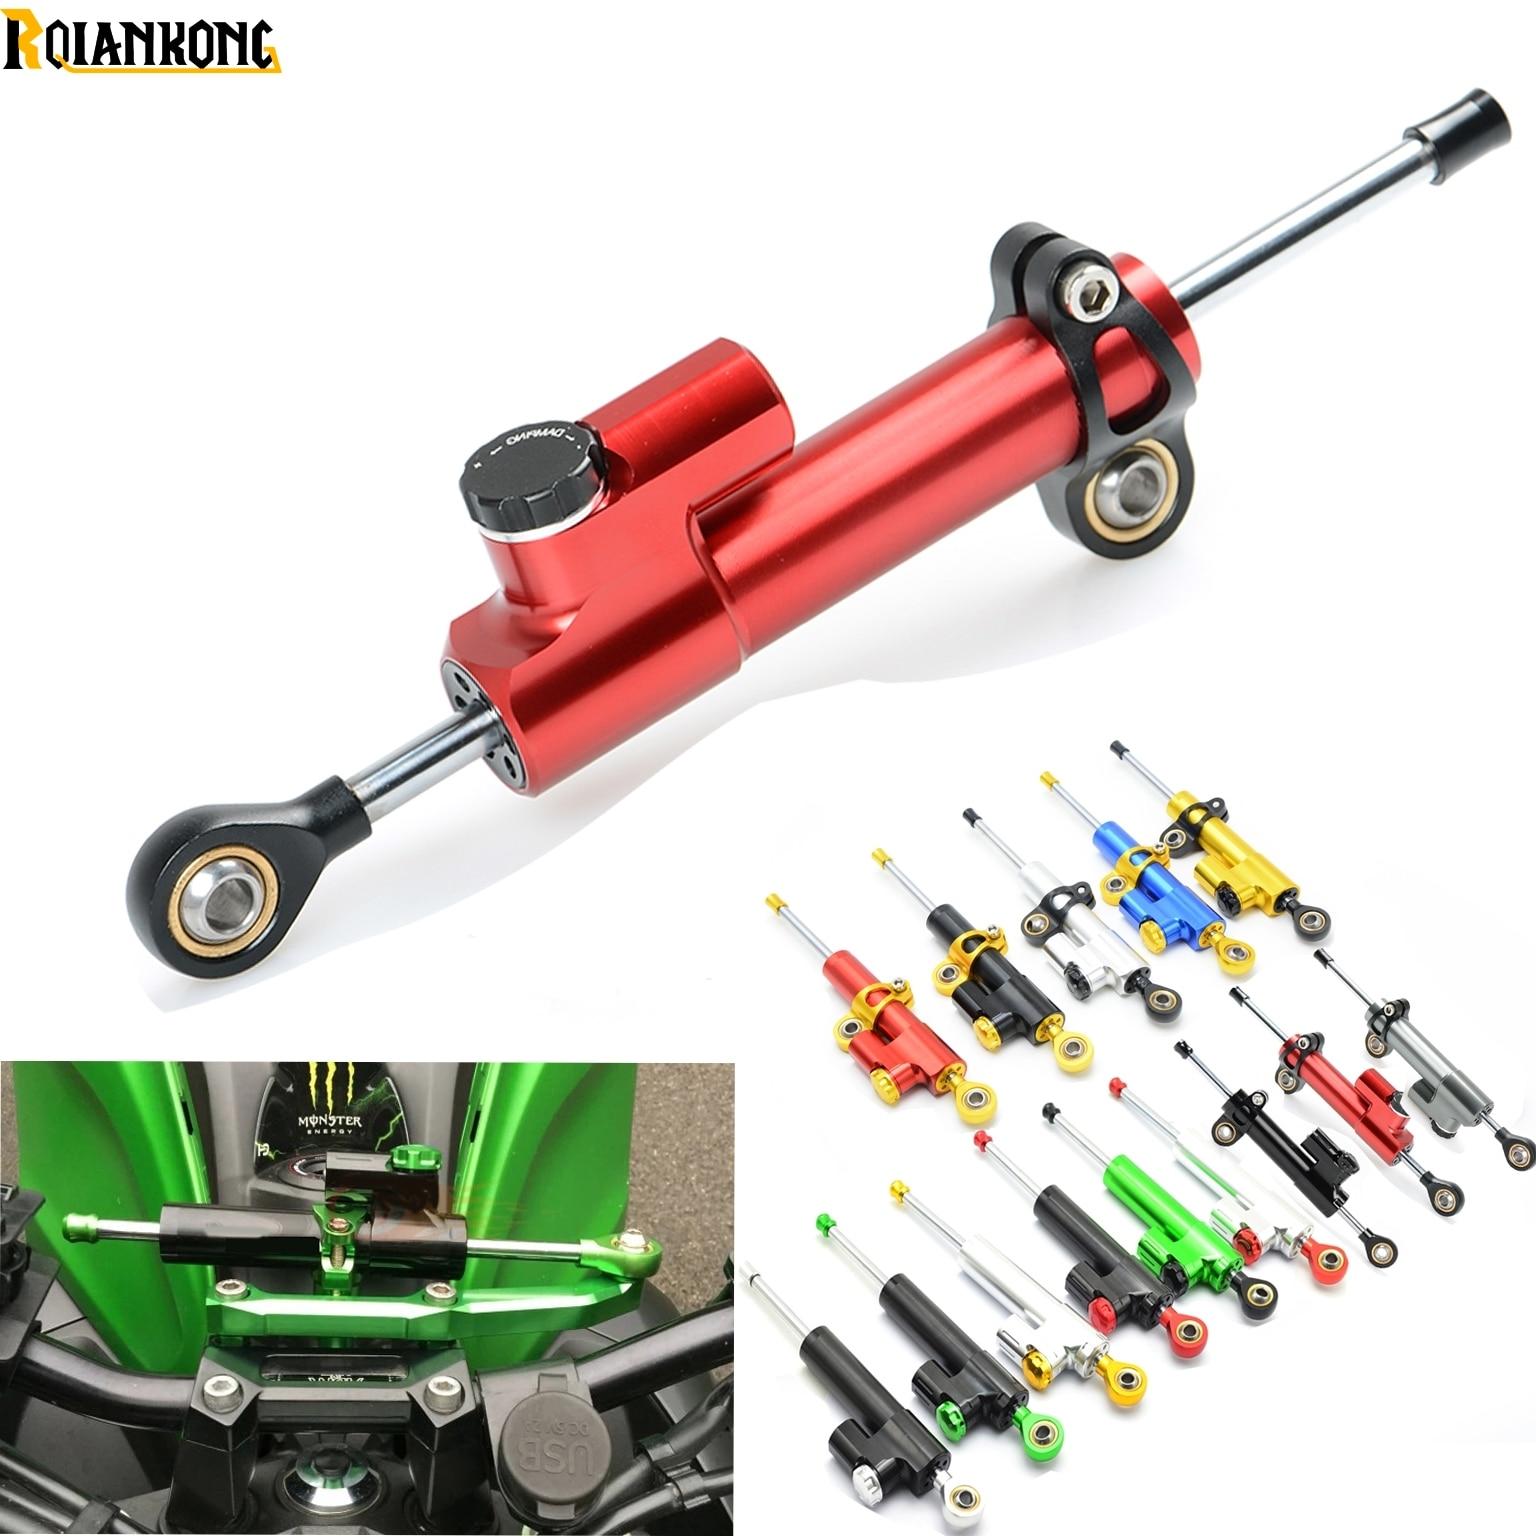 CNC Aluminum Motorcycle Steering Damper Stabilizer Linear Safe Control for Honda CB1000R CB1100 CB599 / CB600 HORNET CB600F<br>